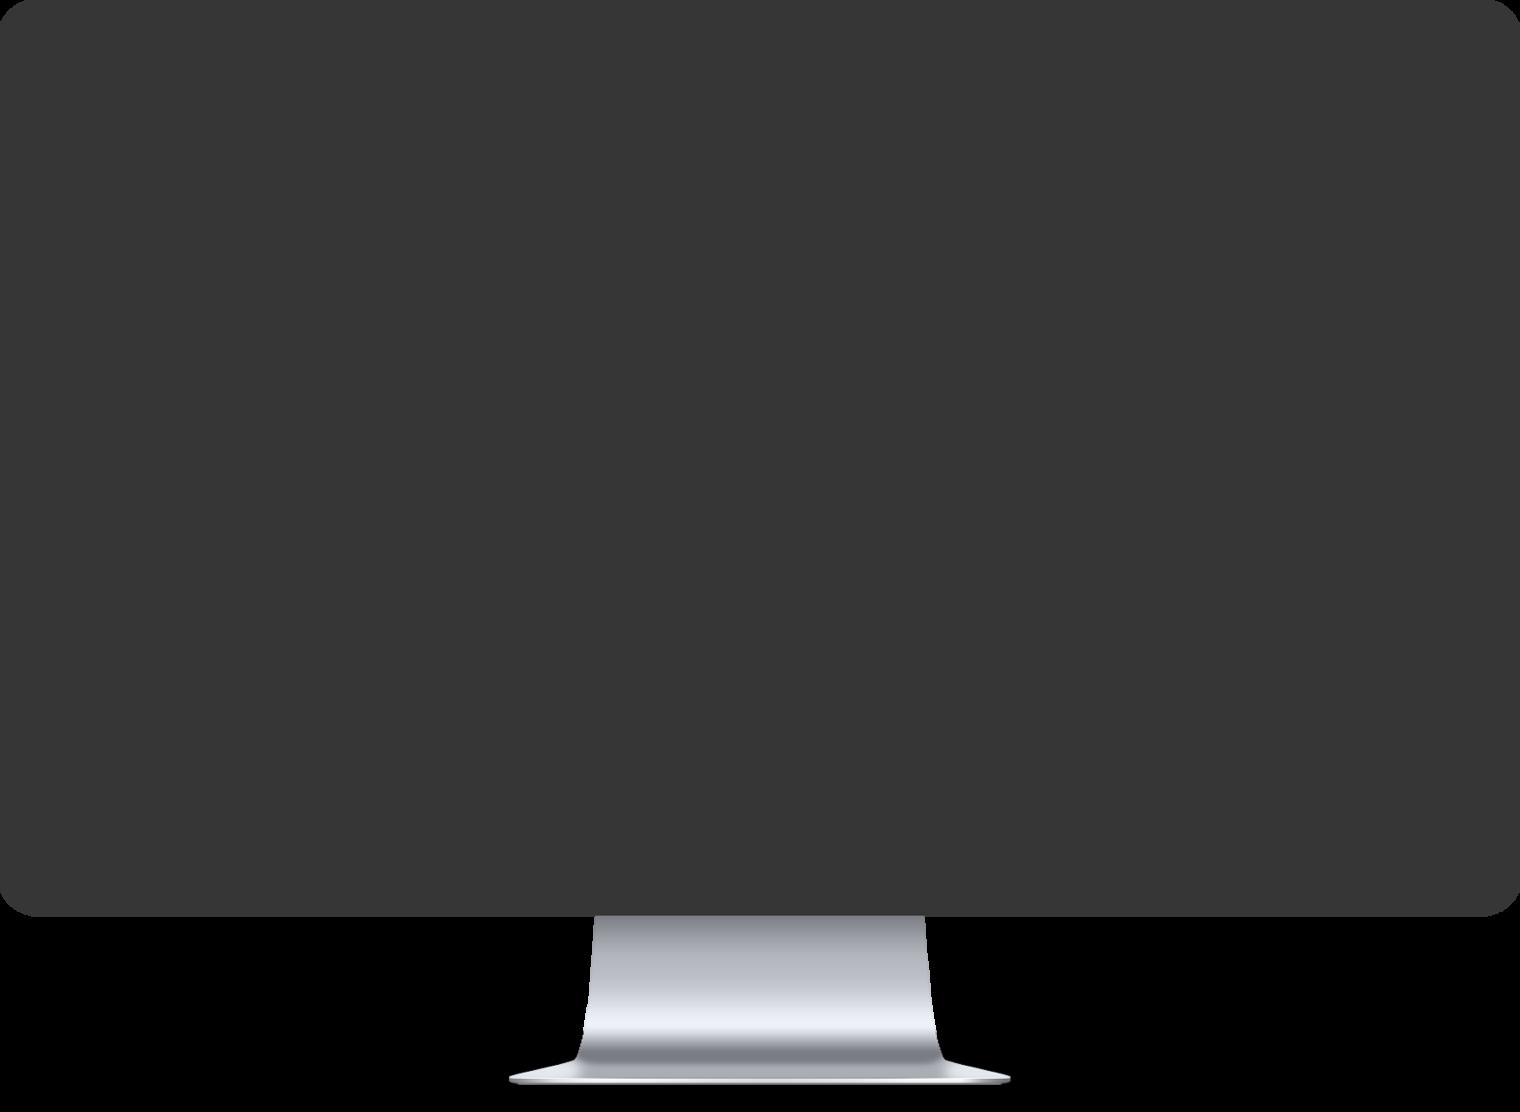 Mac-Mockup1